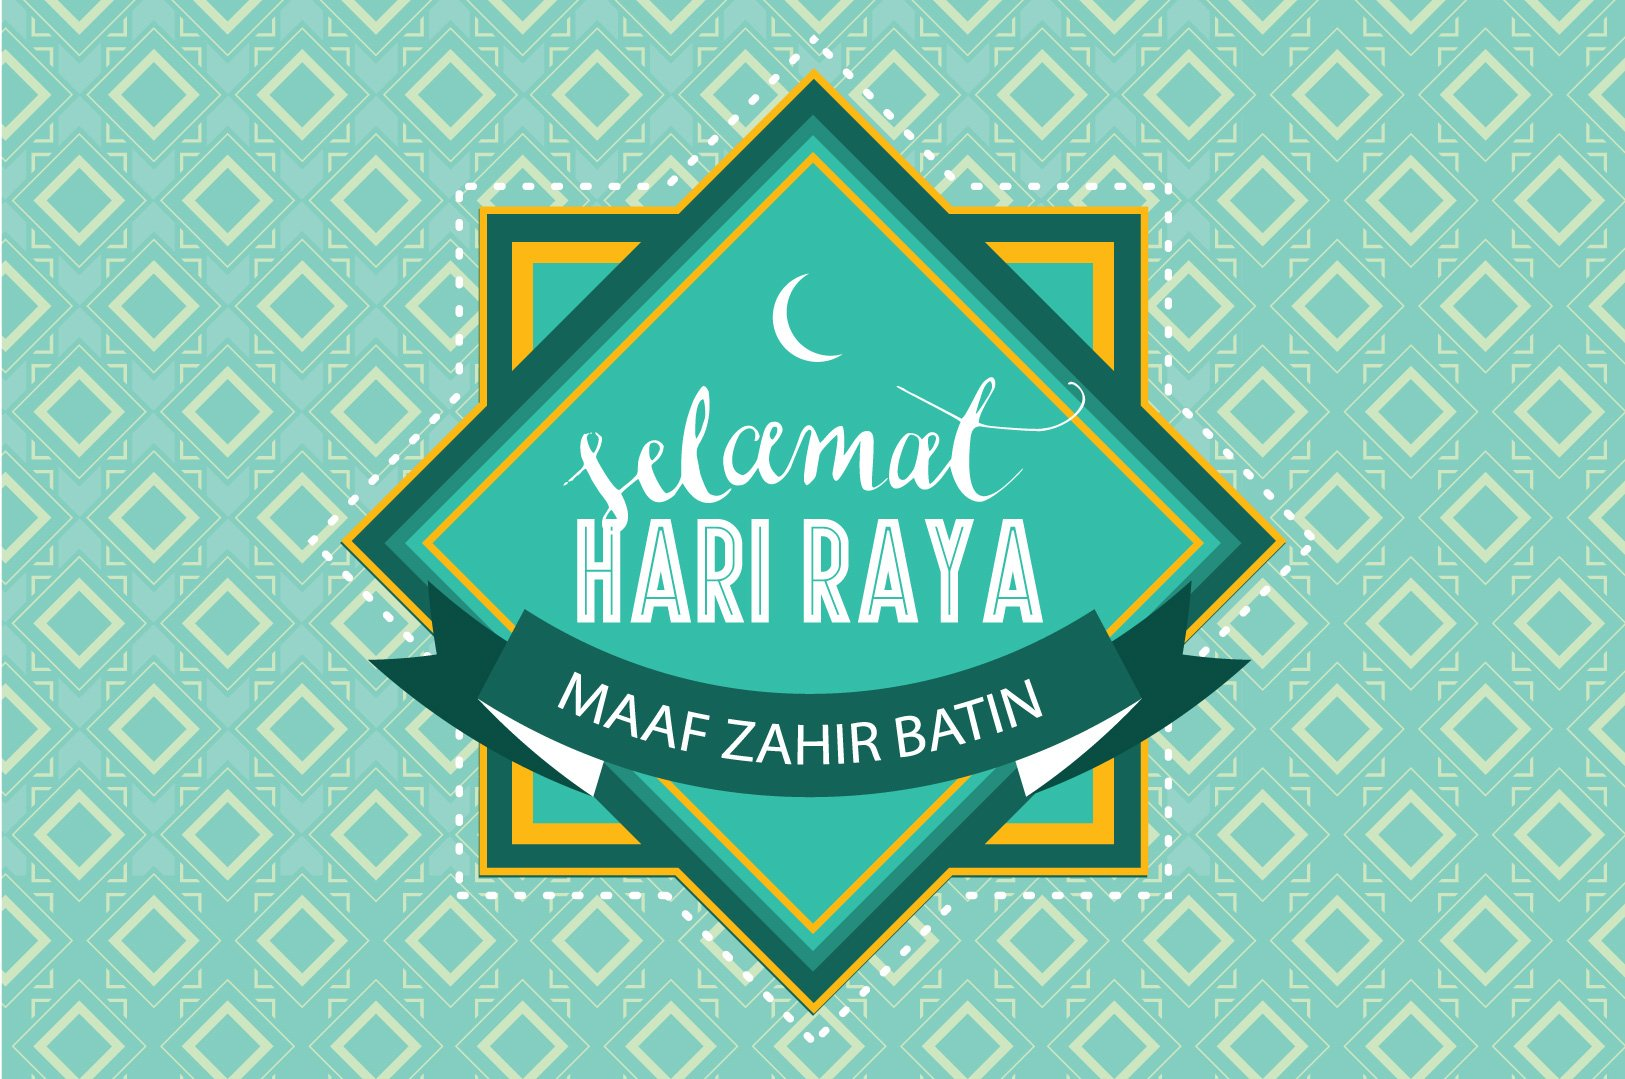 Hari raya greeting template vector illustrations creative market kristyandbryce Image collections